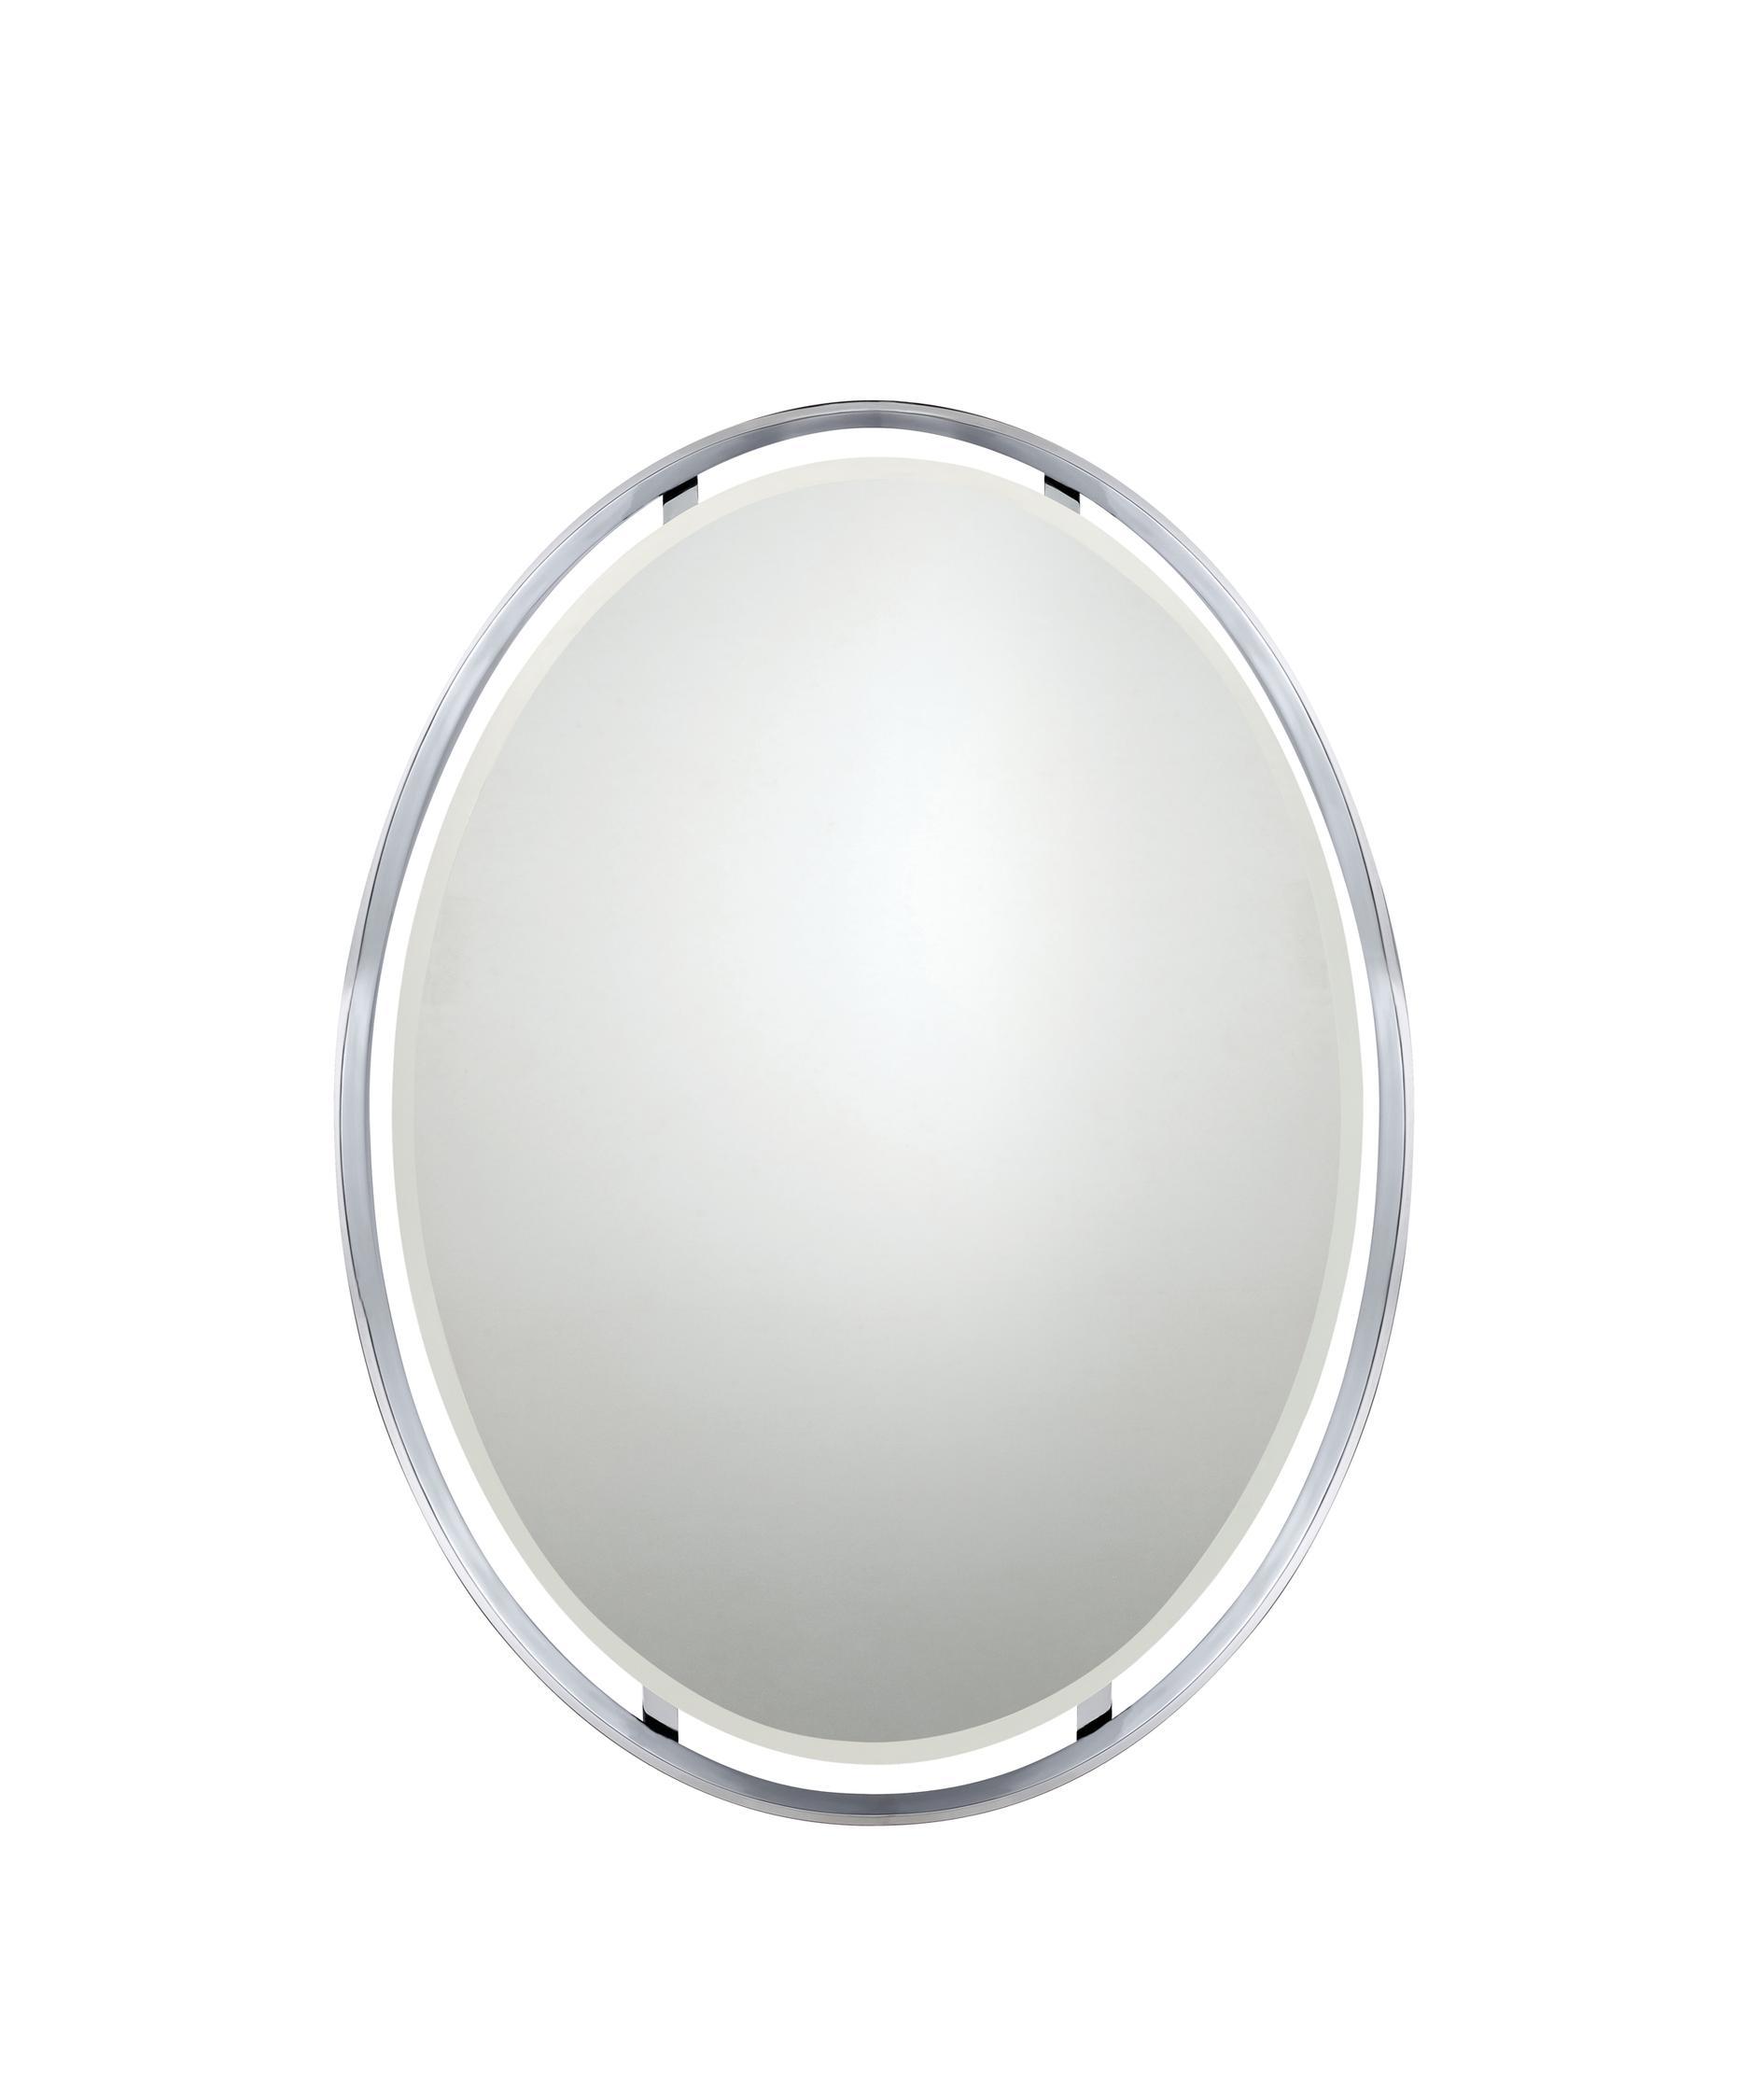 Chrome Wall Mirror quoizel uprz43426 uptown ritz wall mirror | capitol lighting 1